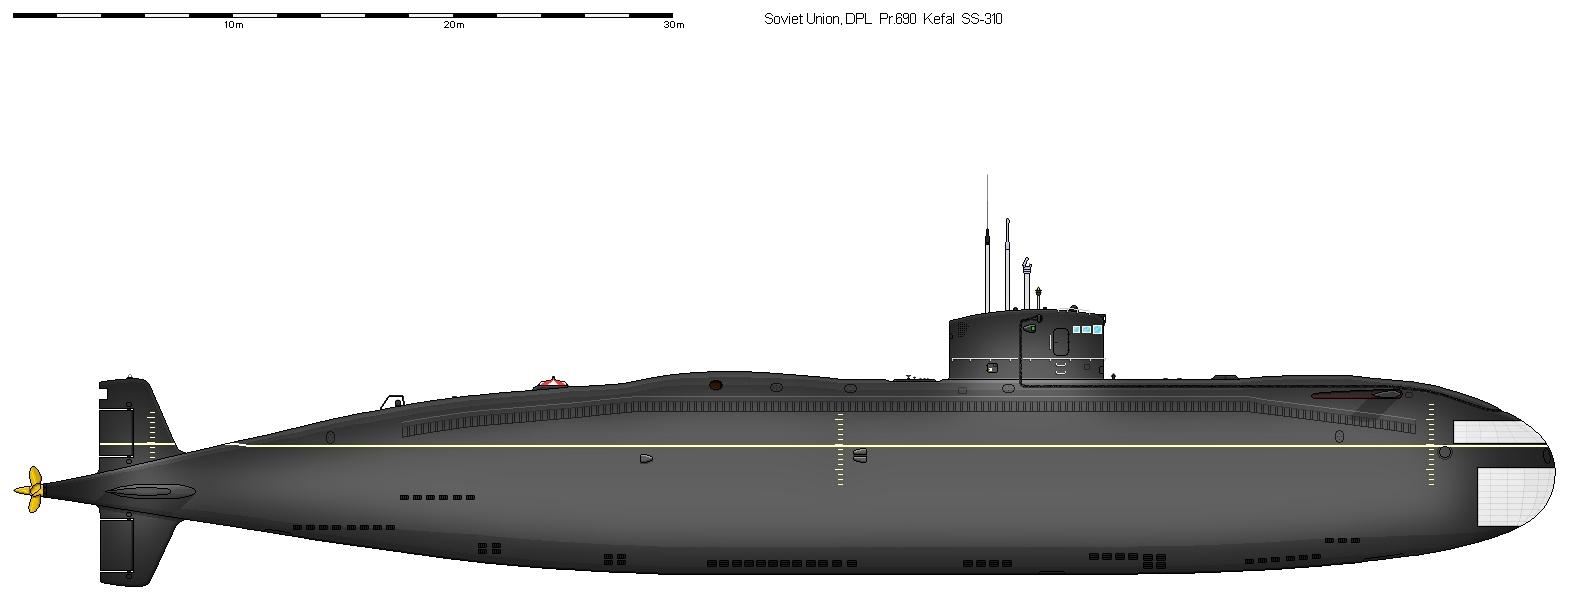 USSR Pr690 (2).jpg